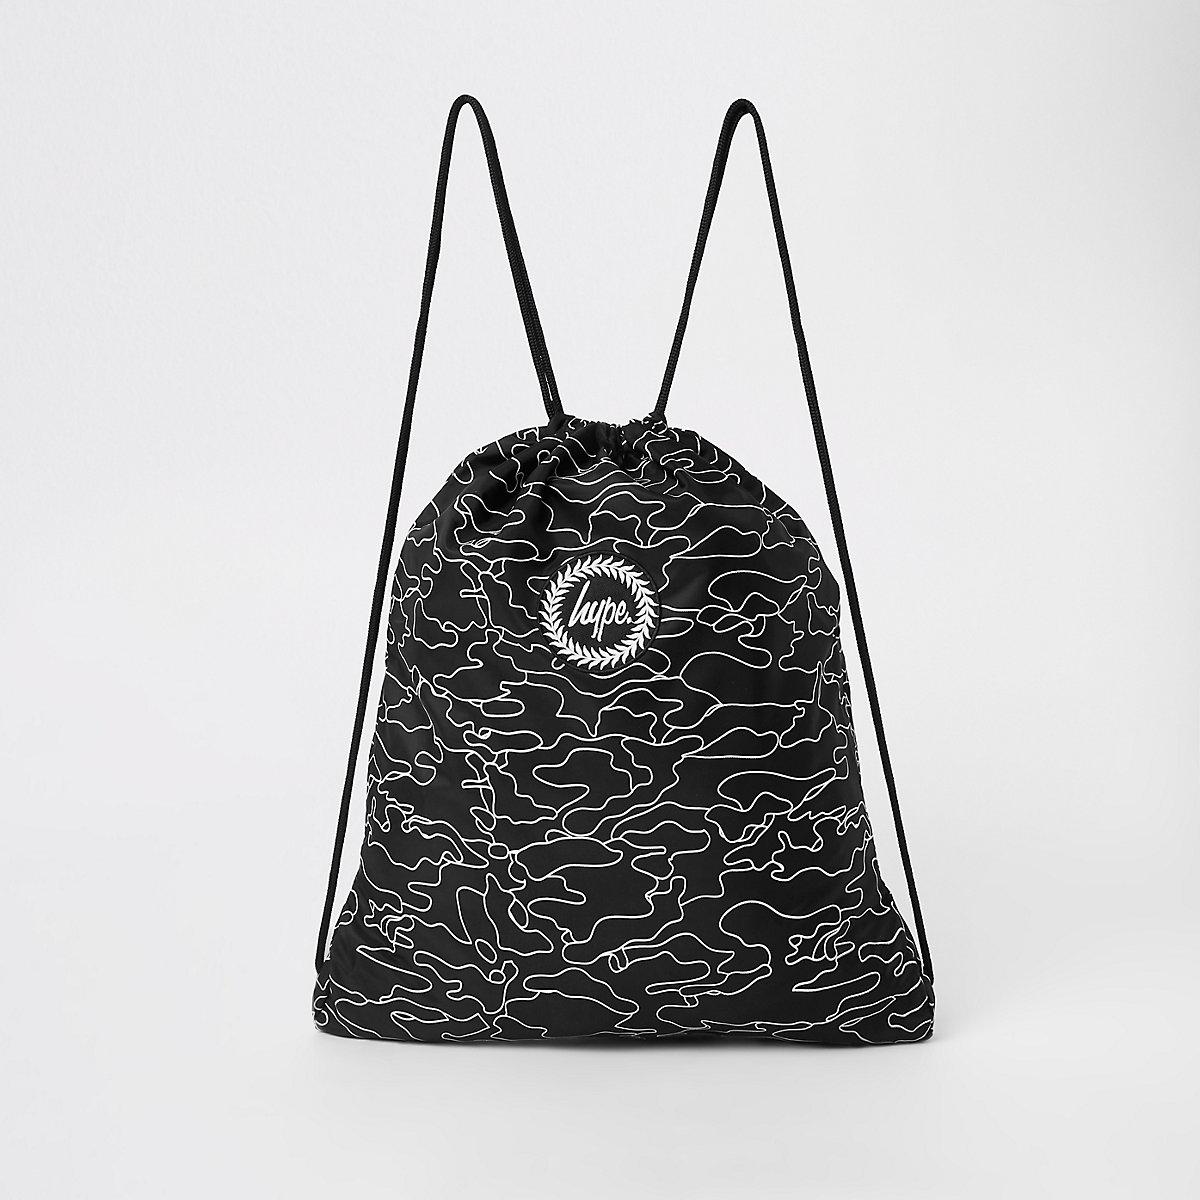 Hype black logo print drawstring bag